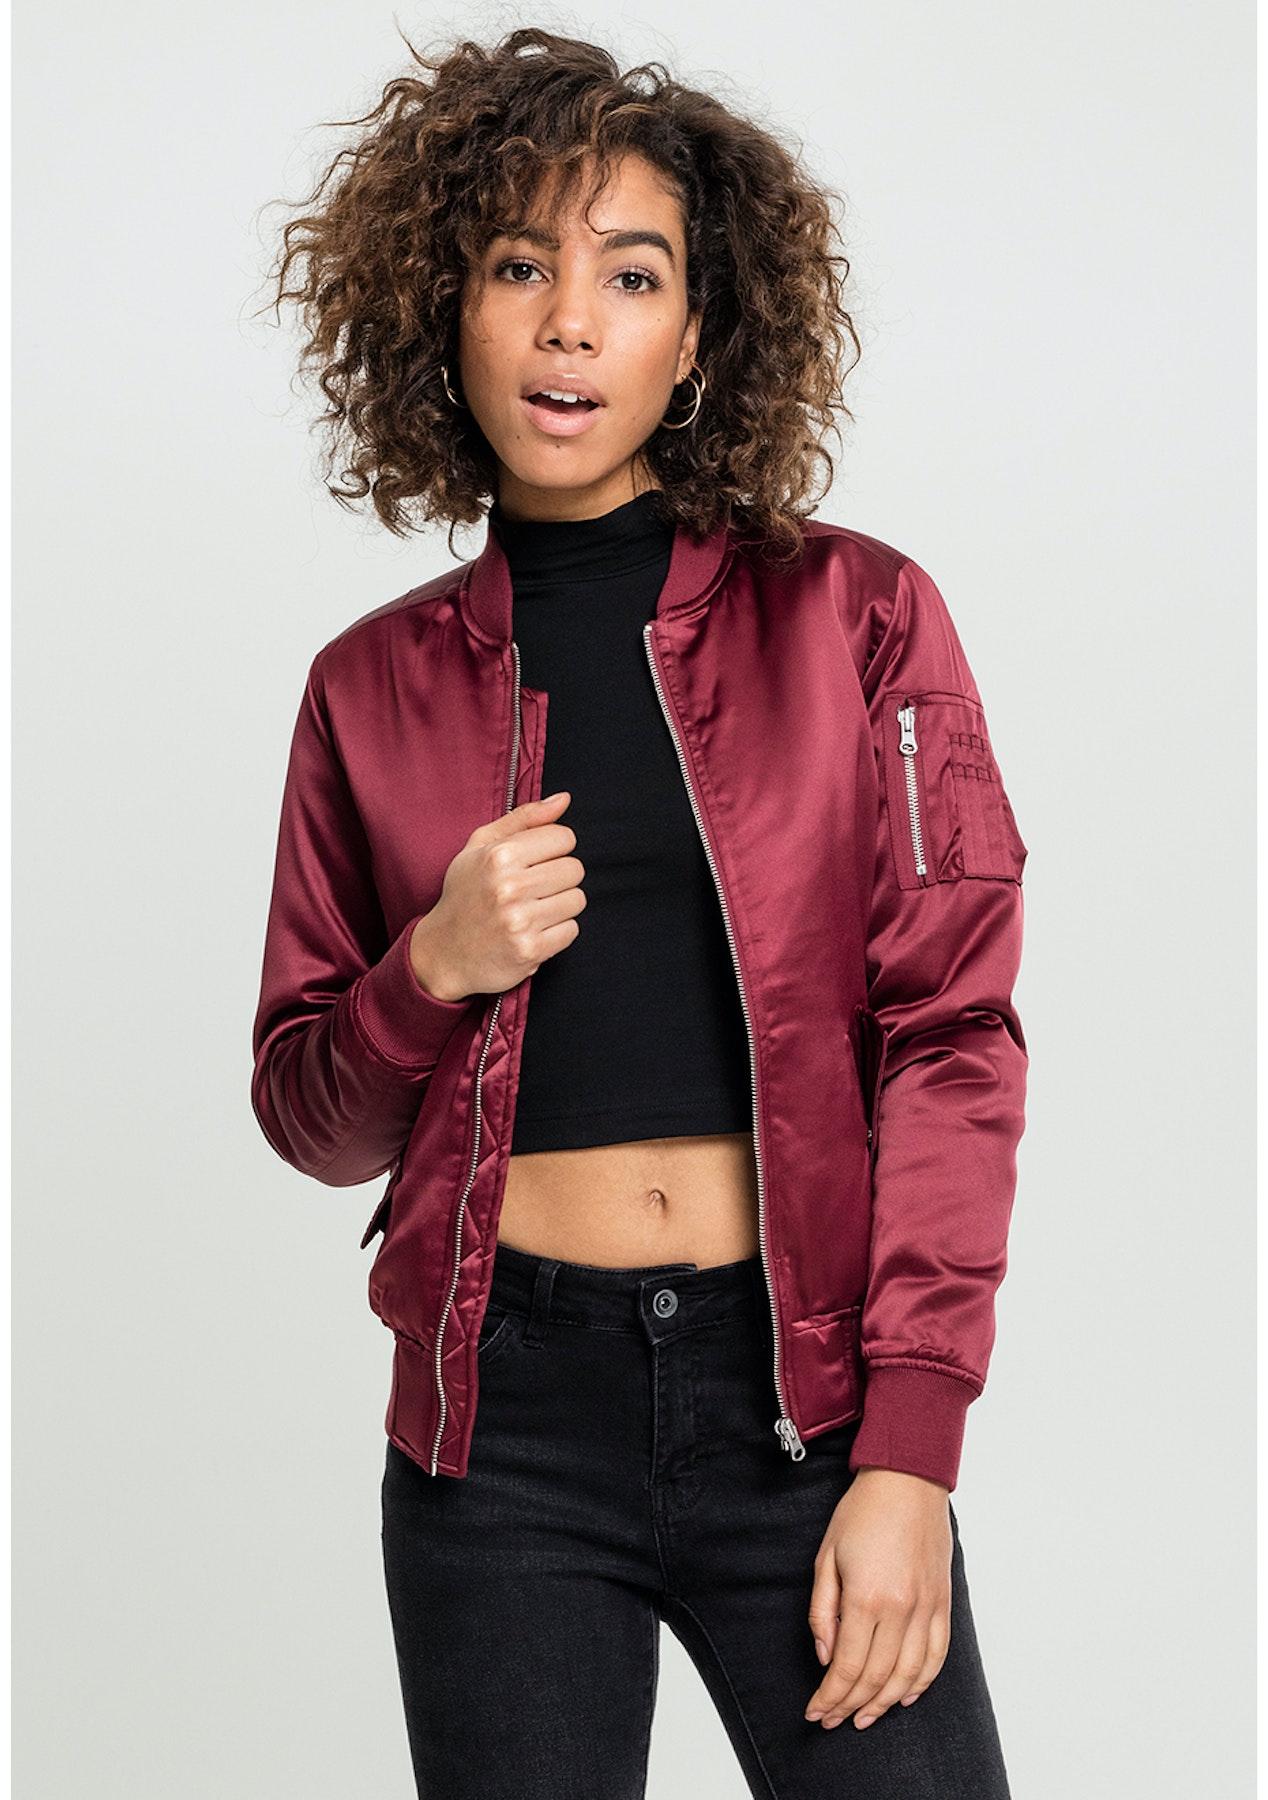 882876c2 Urban Classics - Womens Satin Bomber Jacket - Burgundy - The Streetwear  Edit - Onceit